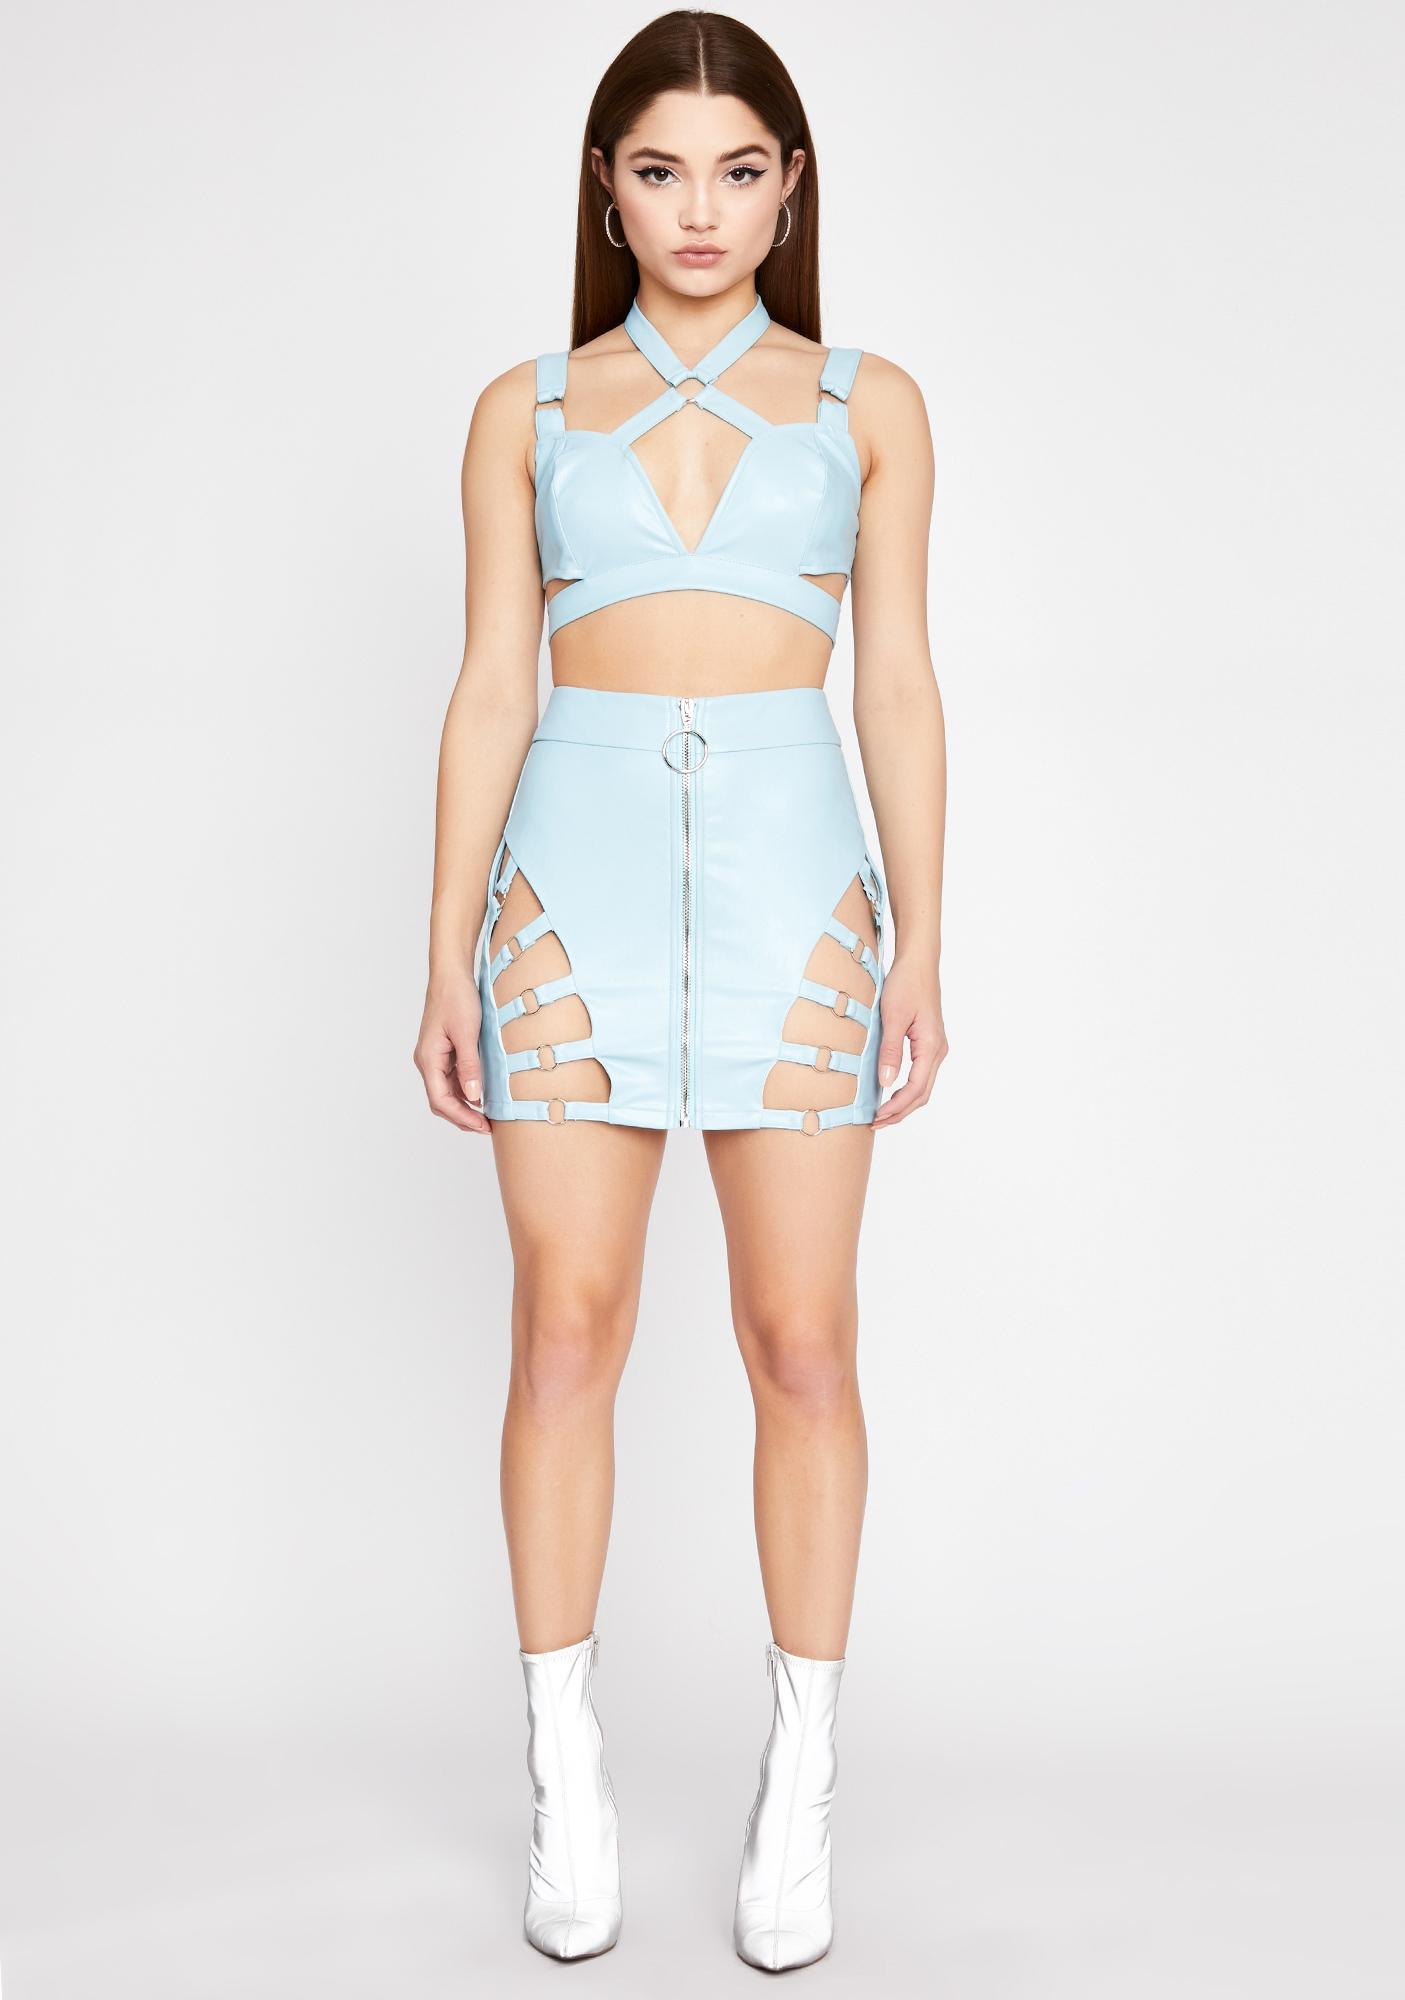 Sky Iconic Kinks Cut-Out Skirt